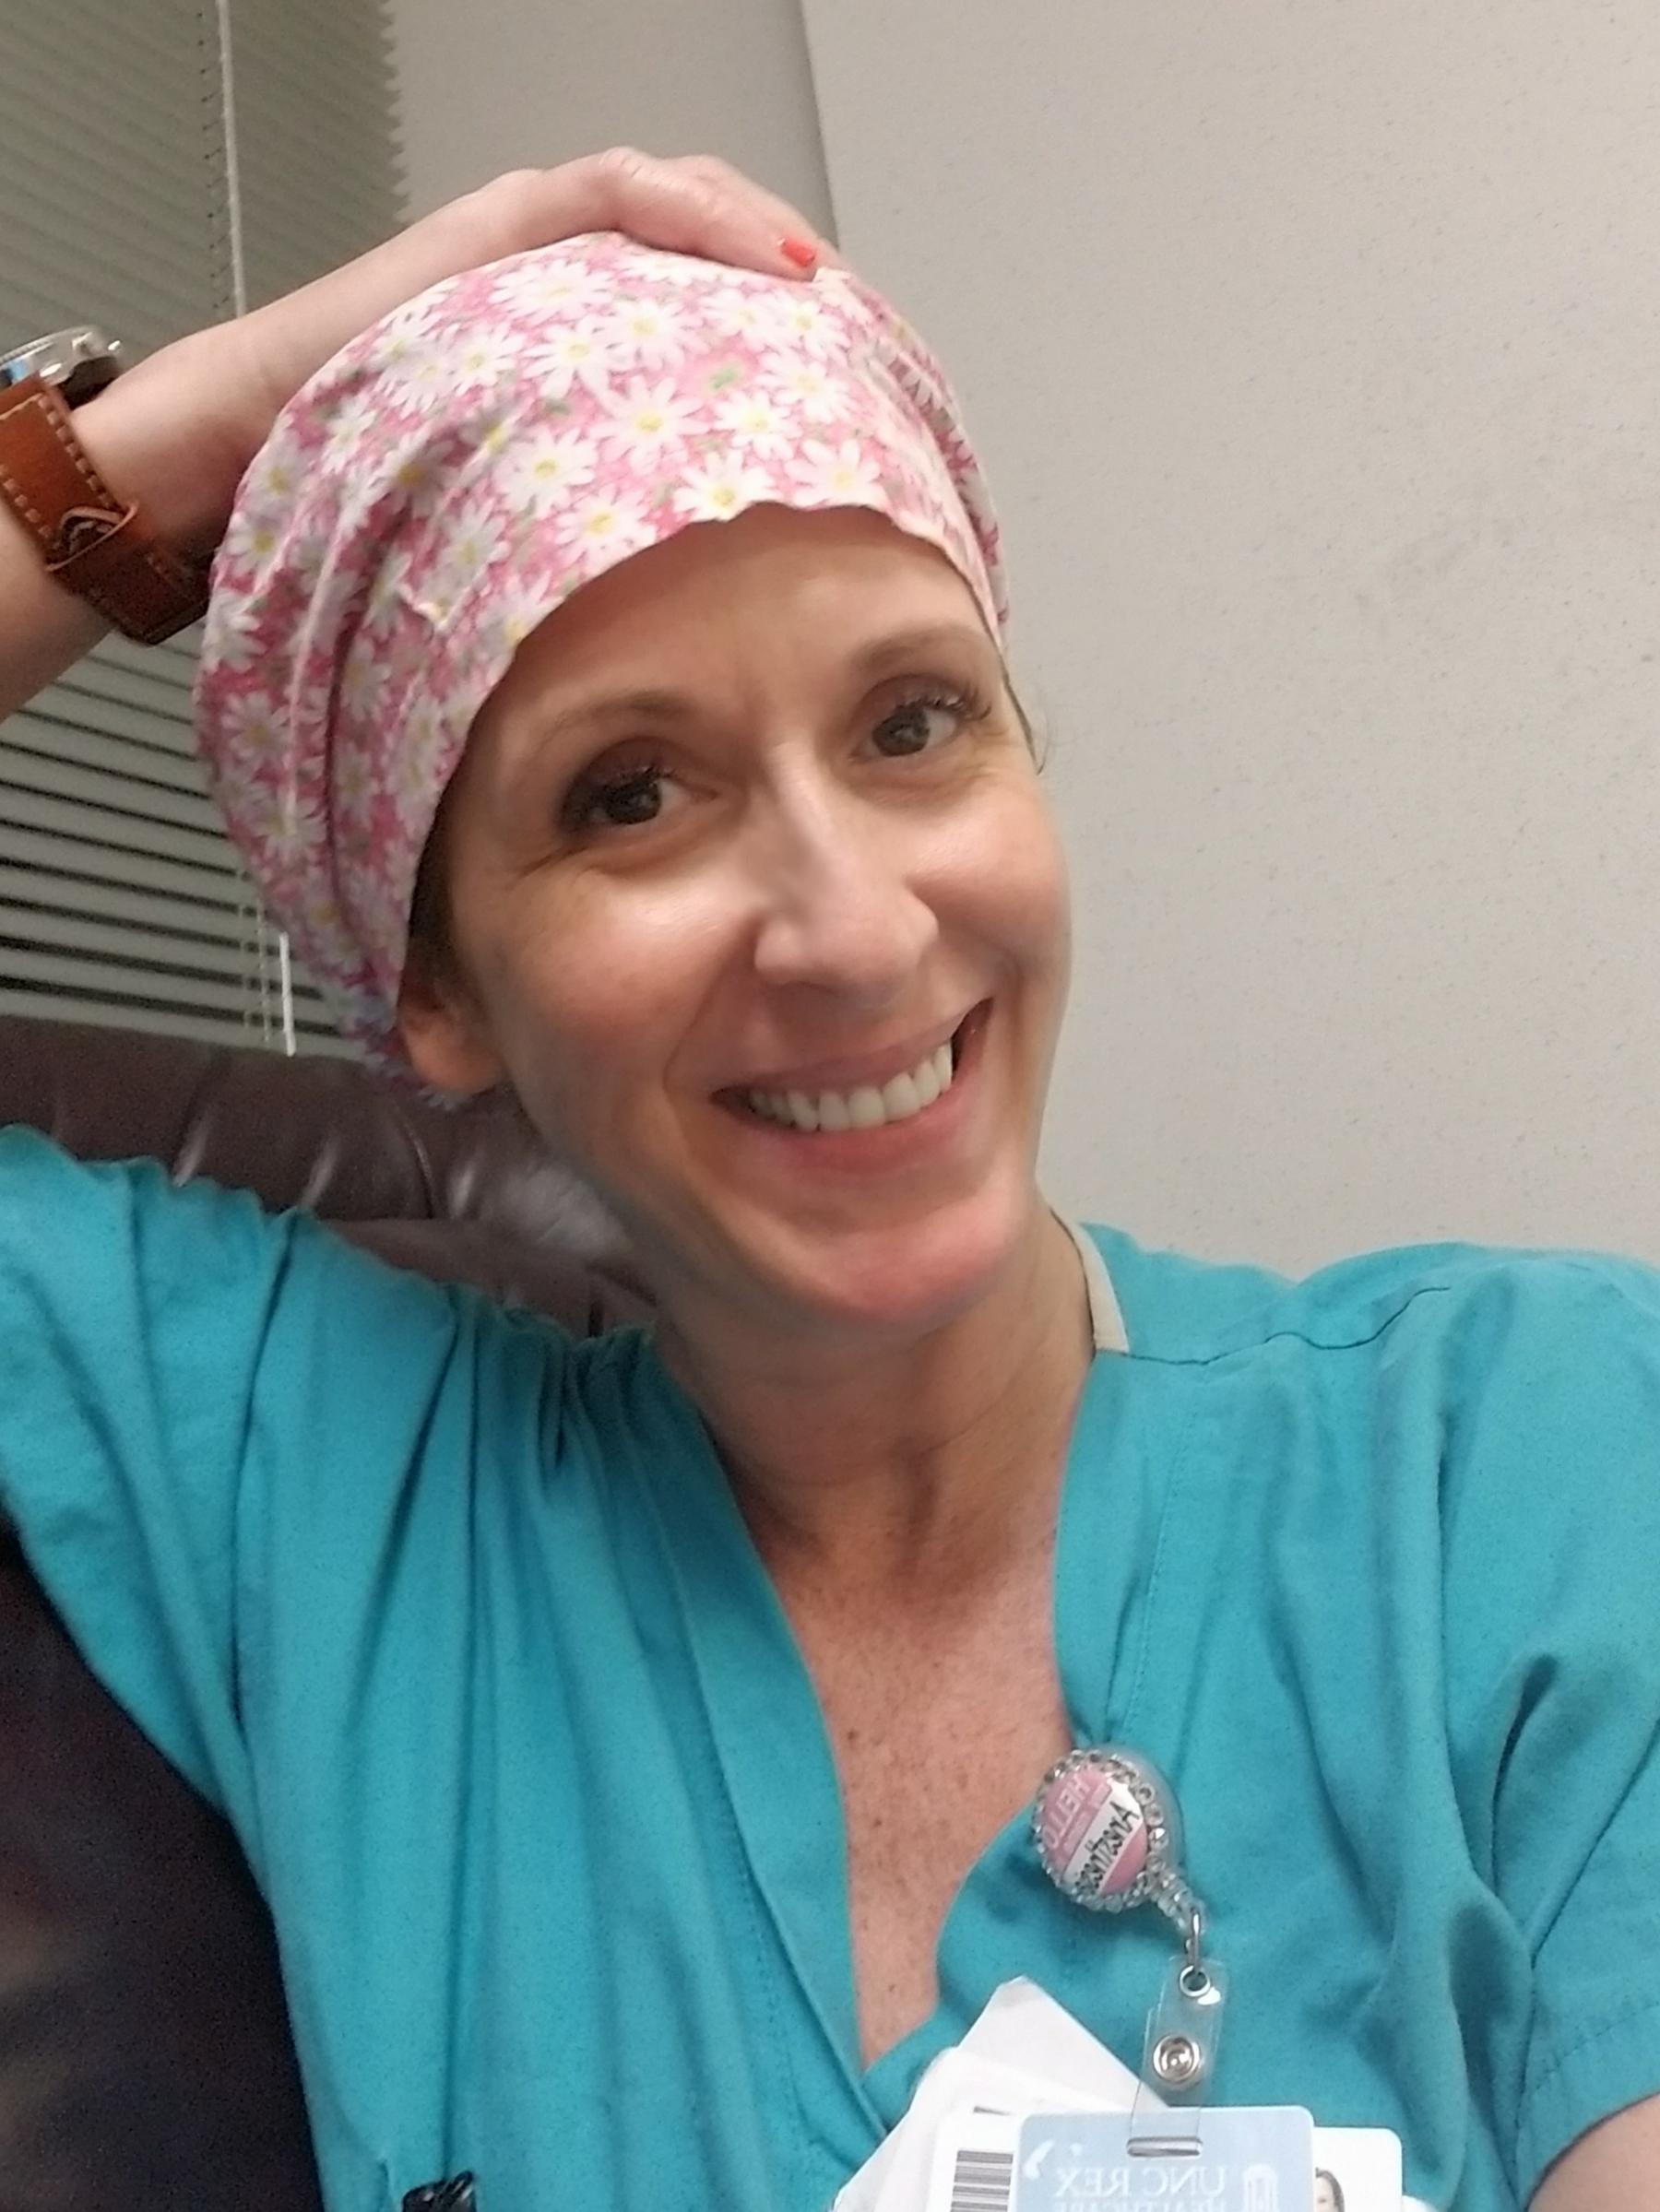 UNCG nurse anesthesia student Bevin Strickland